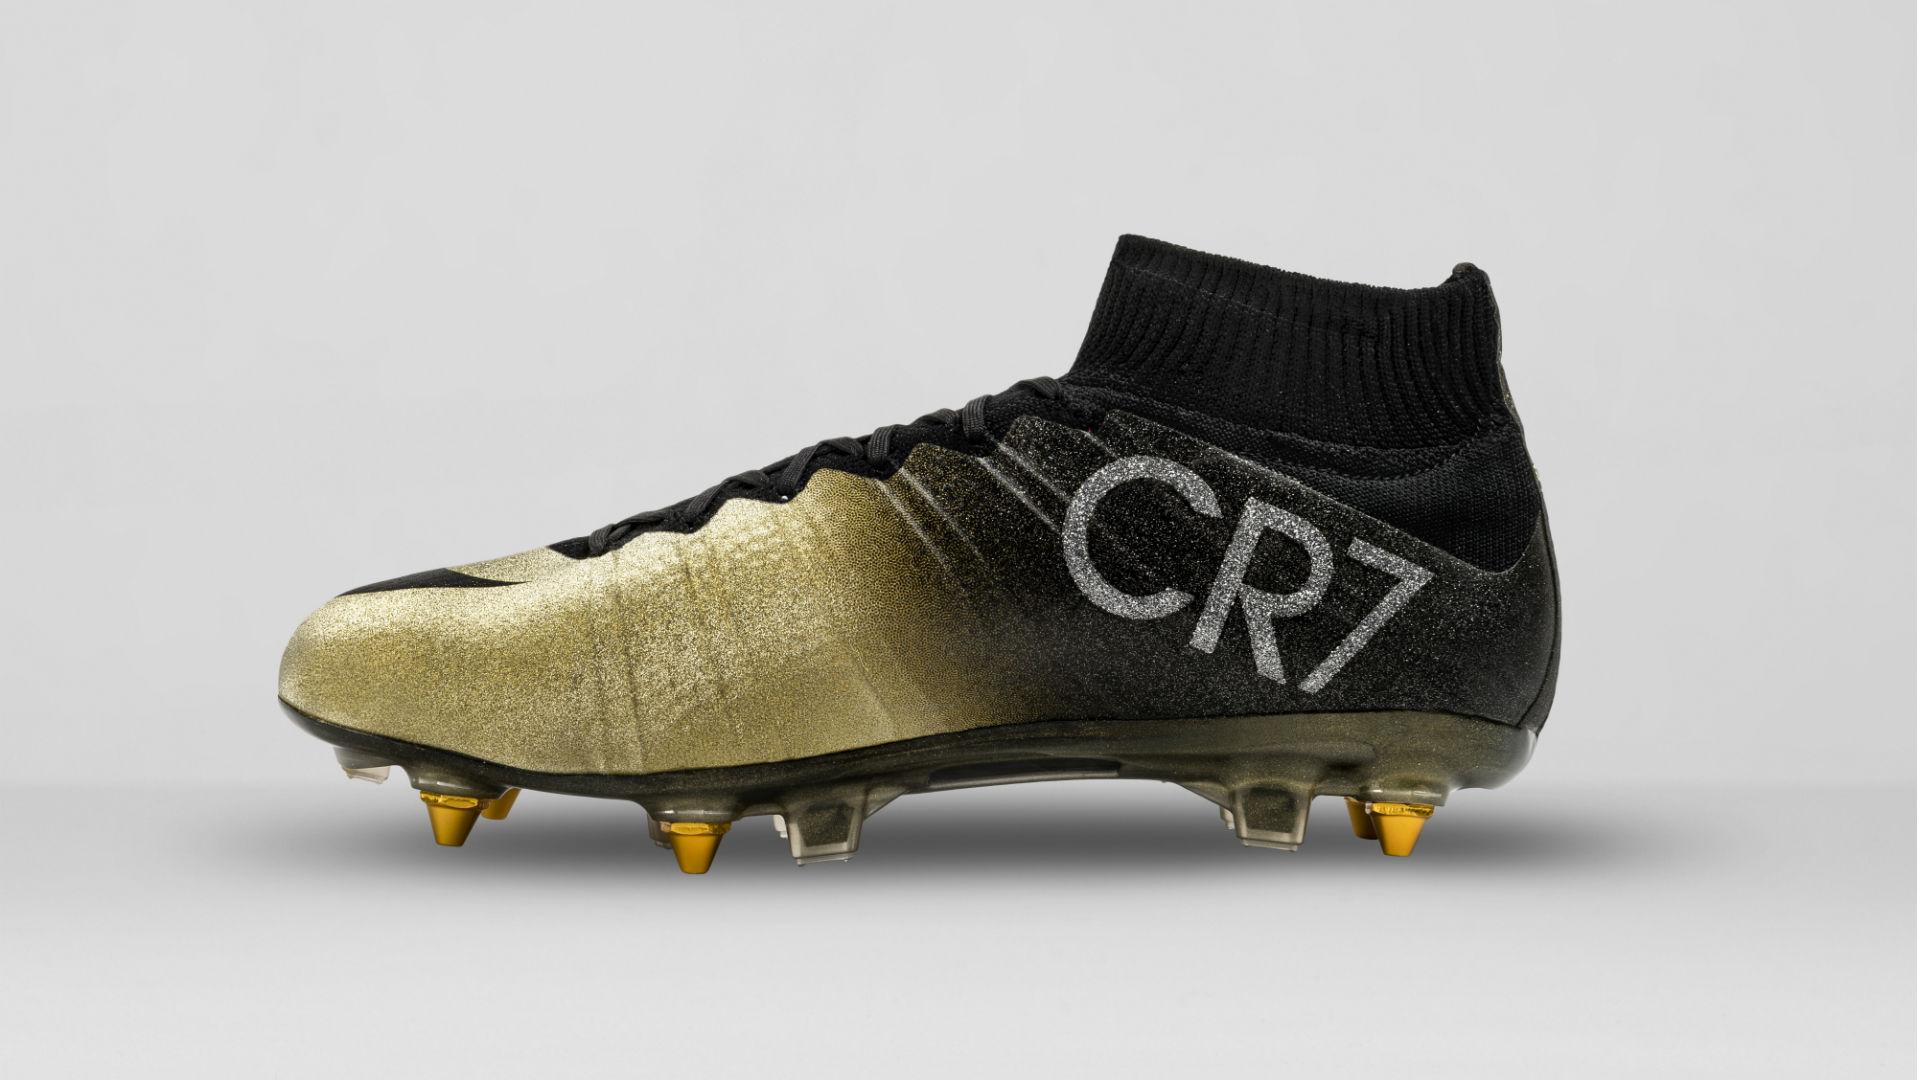 Cristiano Ronaldo Mercurial CR7 Rare Gold